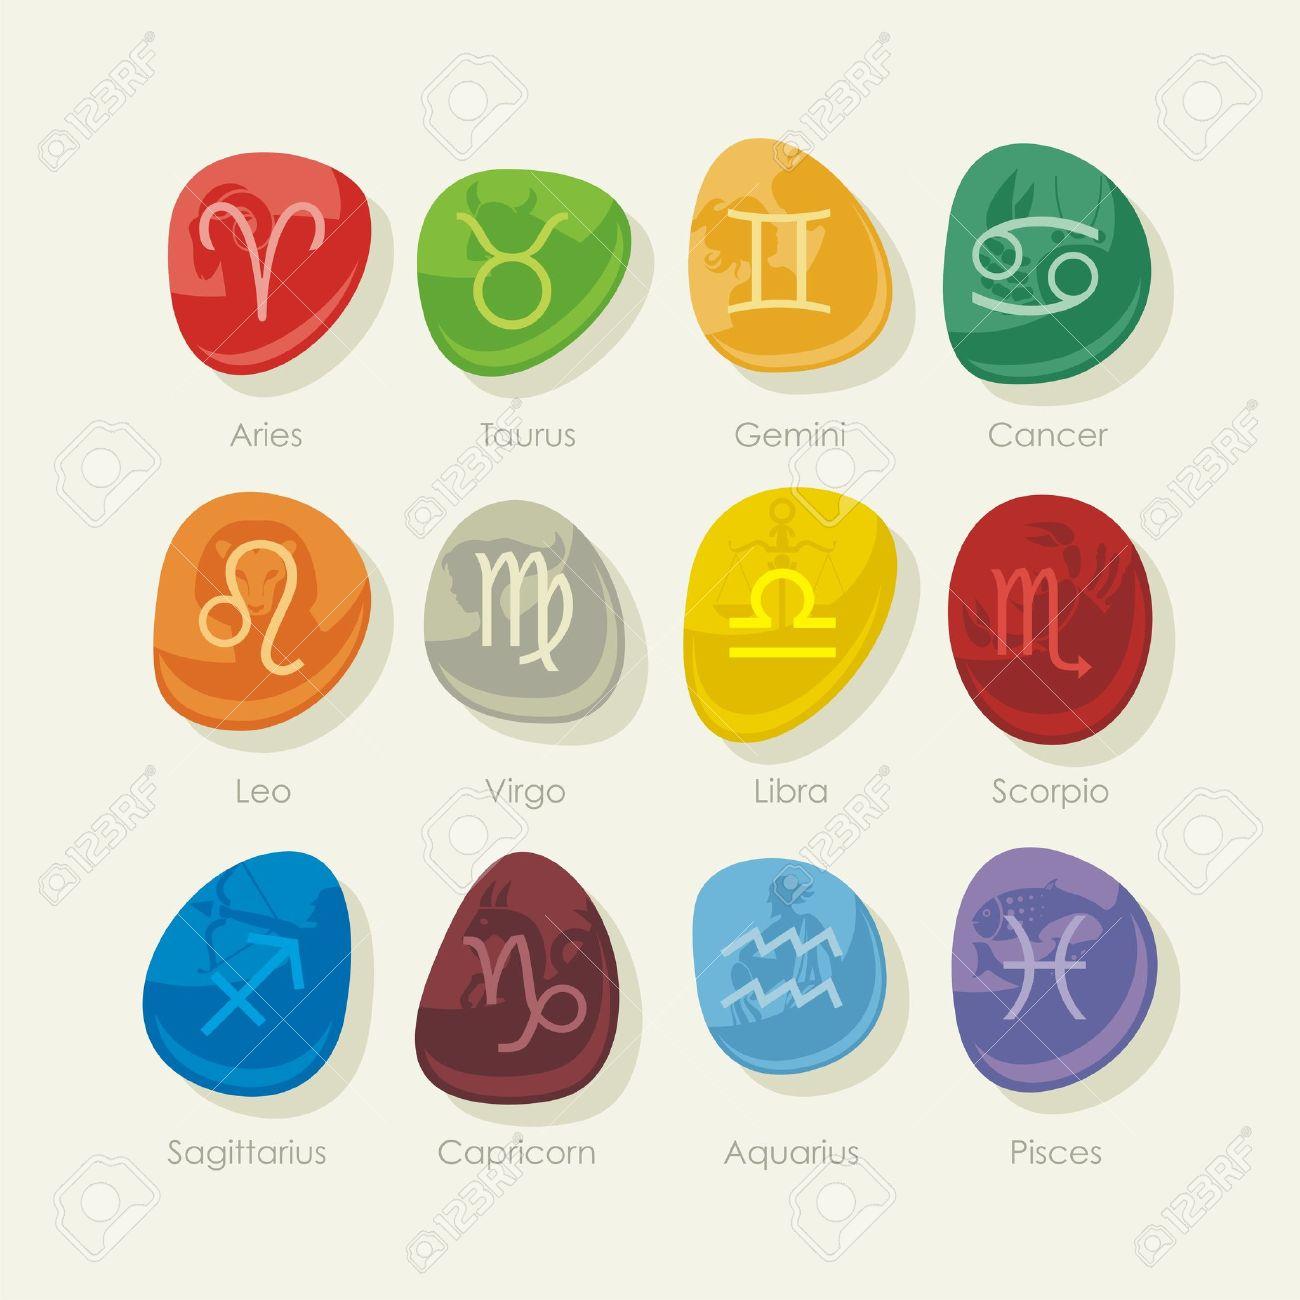 Image Gallery Leo Zodiac Sign Color